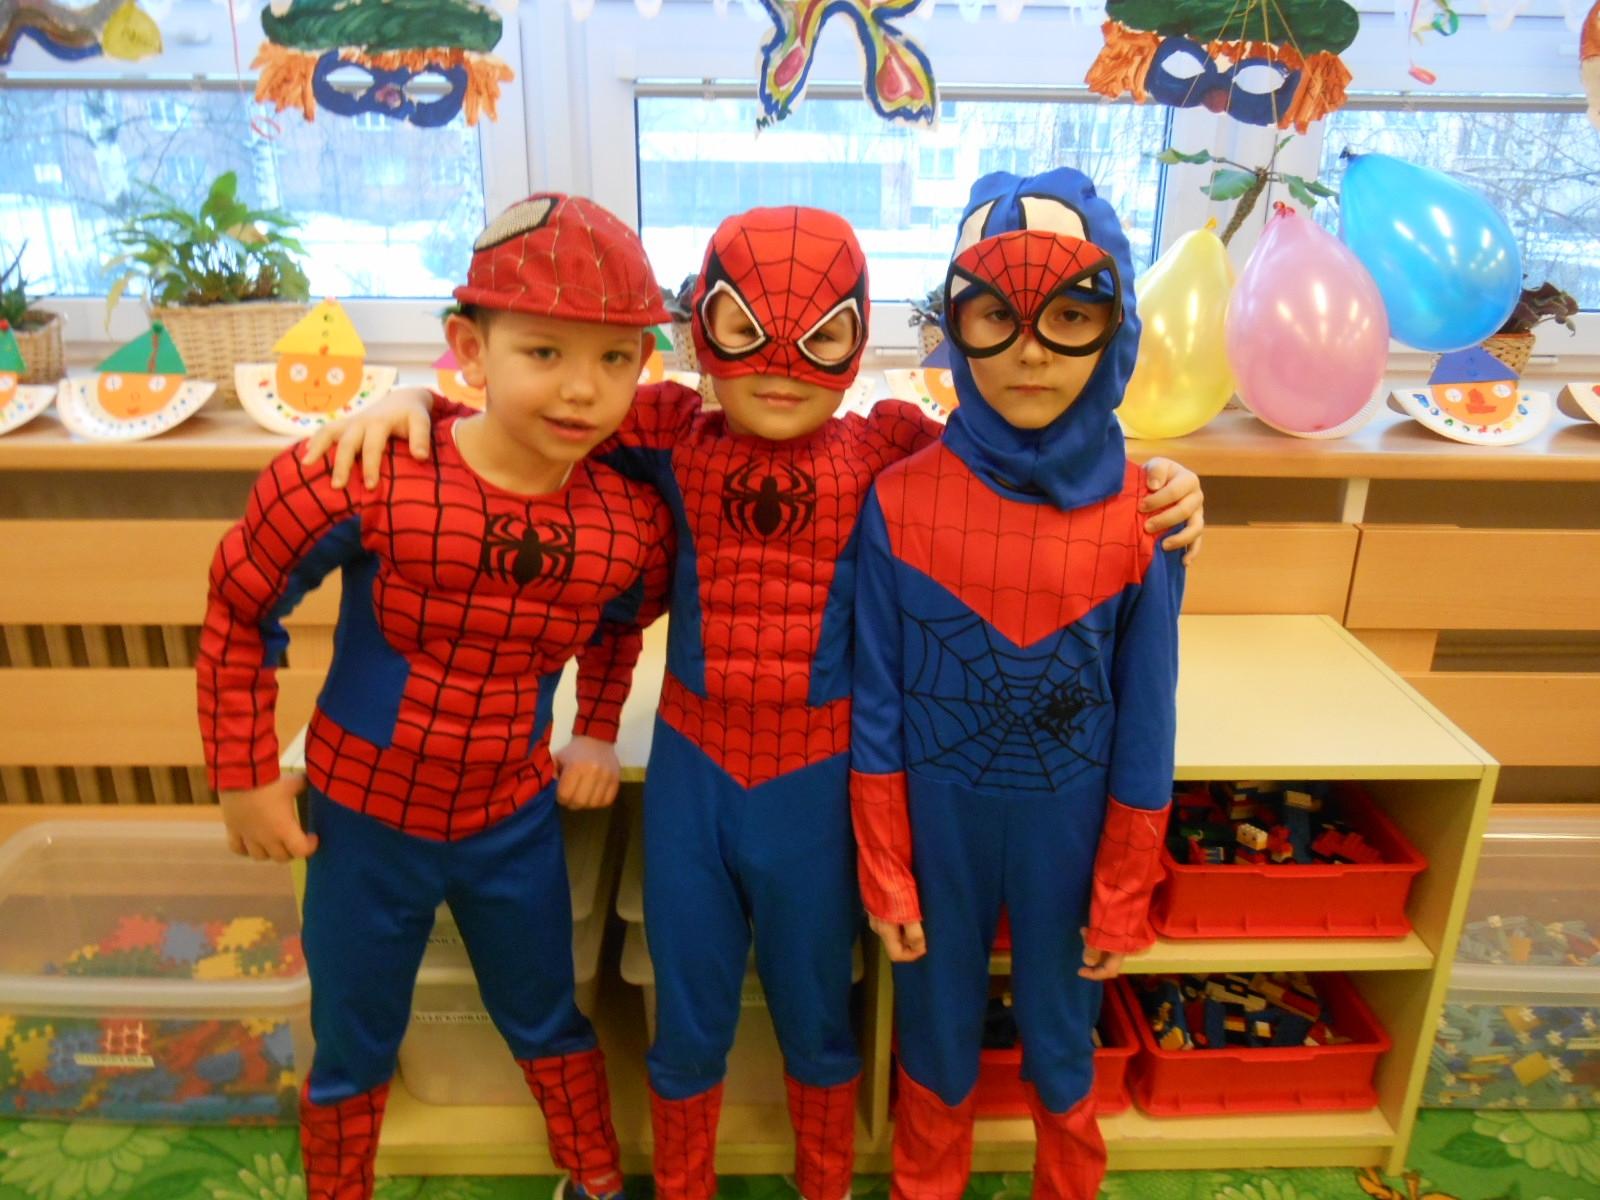 trojice Spidermanů